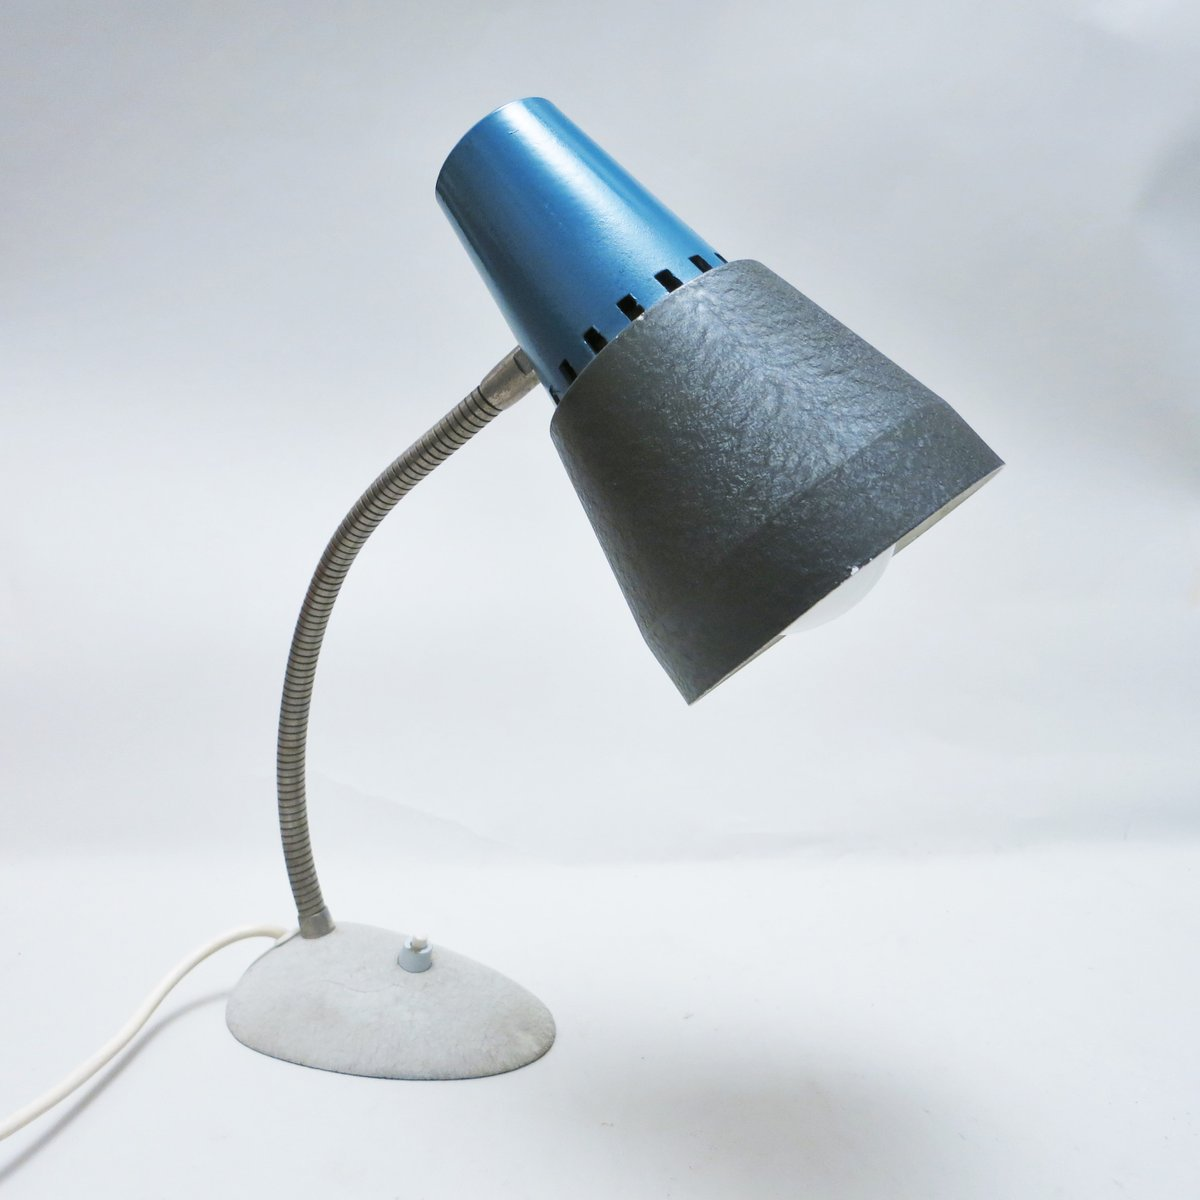 Vintage Small Desk Lamp 1960s